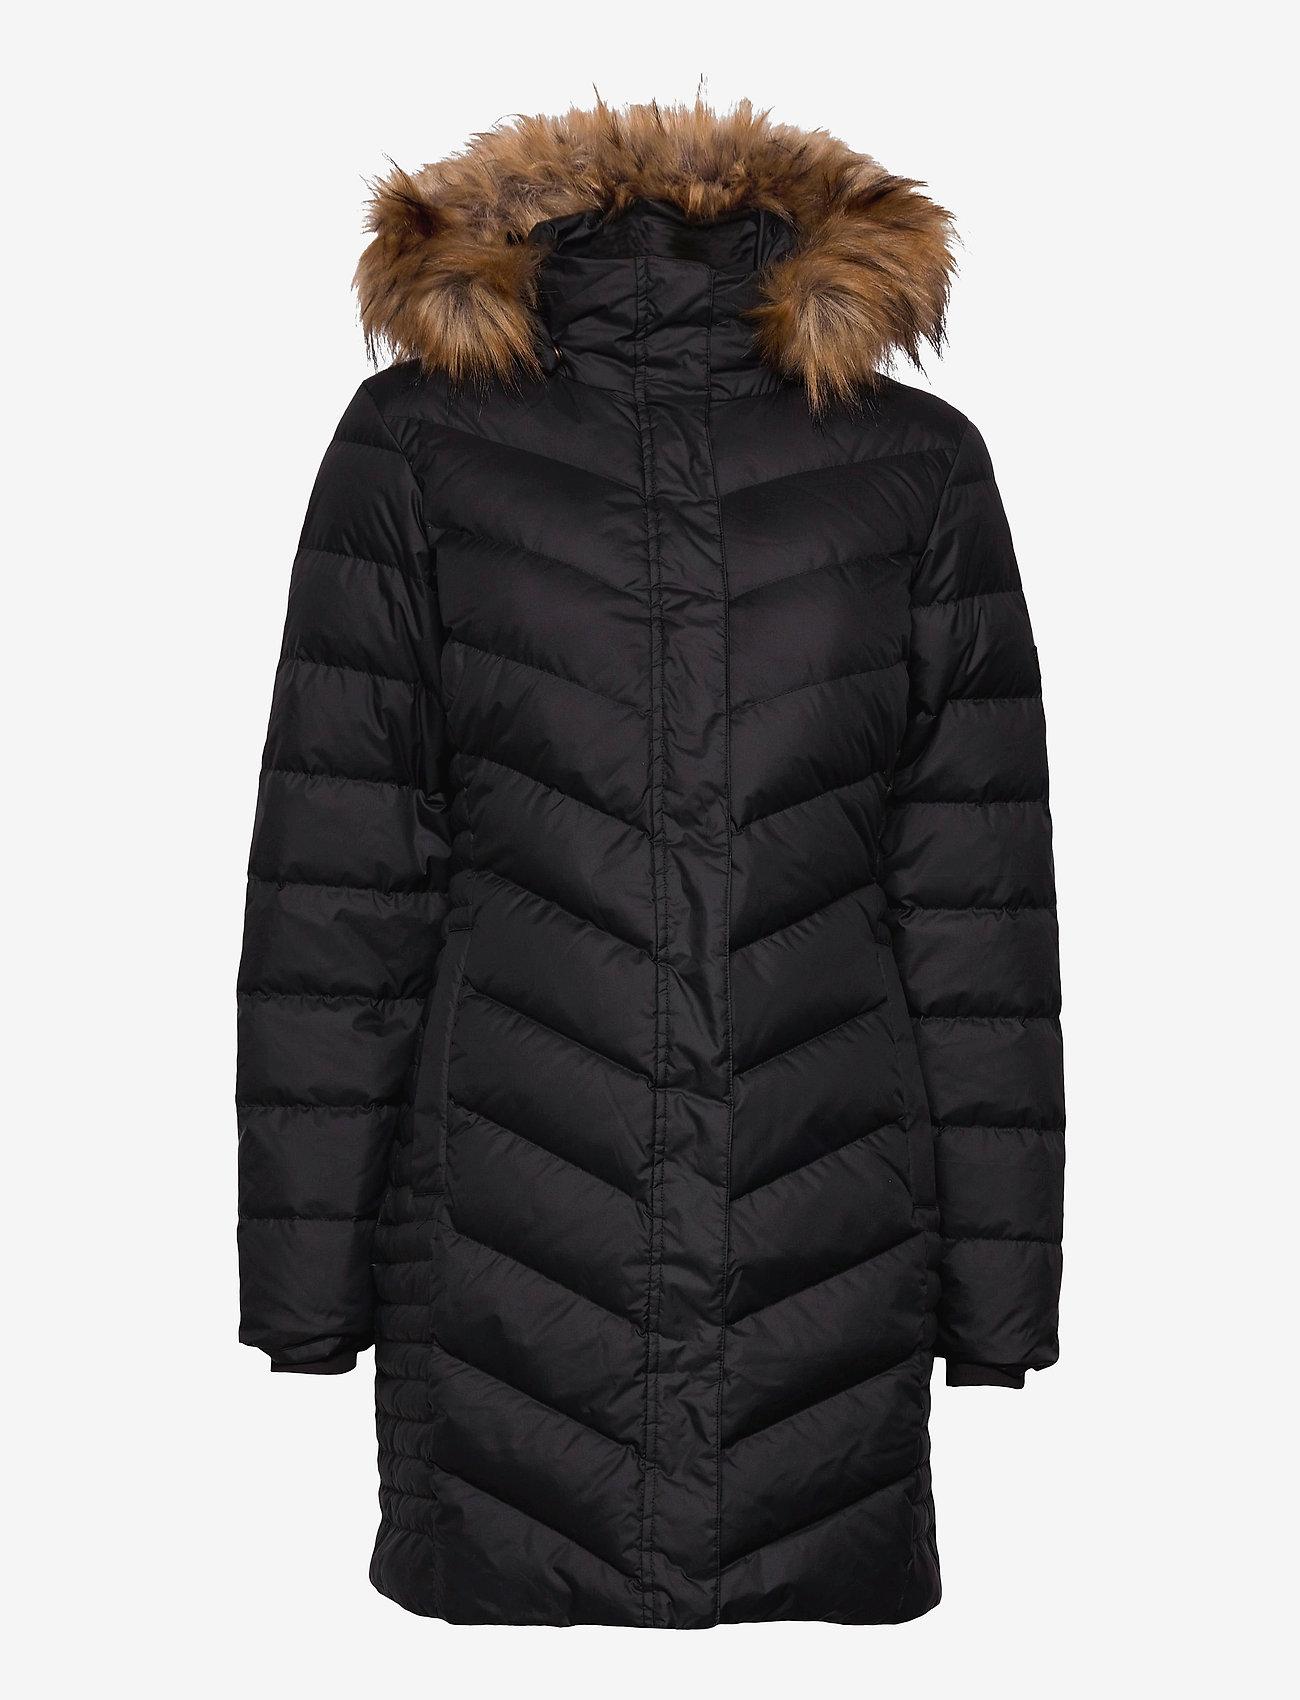 Musto - W EDINBURGH LONG DOWN JKT - sports jackets - true black - 0